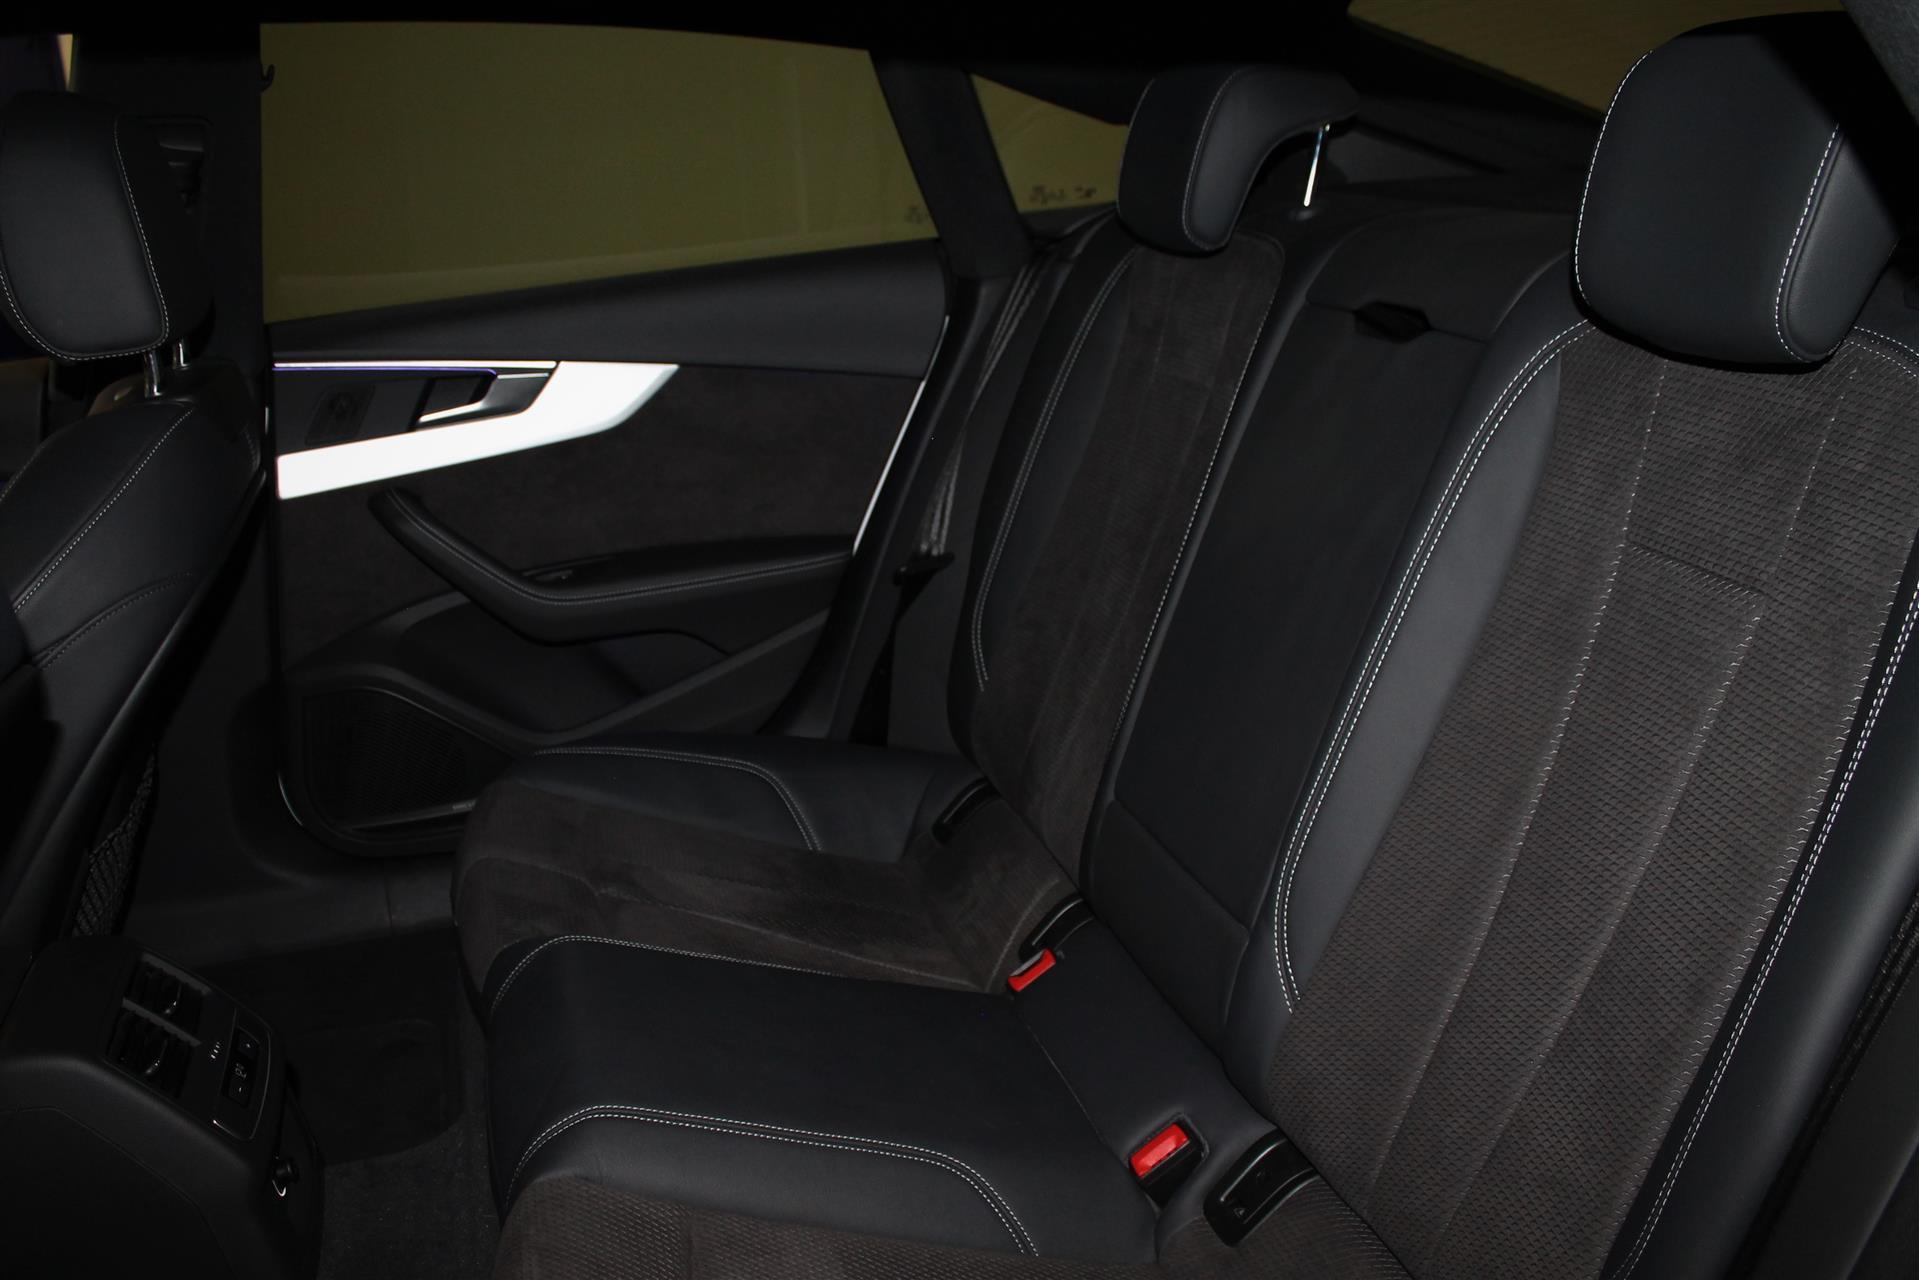 Sportback 3,0 TFSI Quattro Tiptr. 354HK 5d 8g Trinl. Gear image8